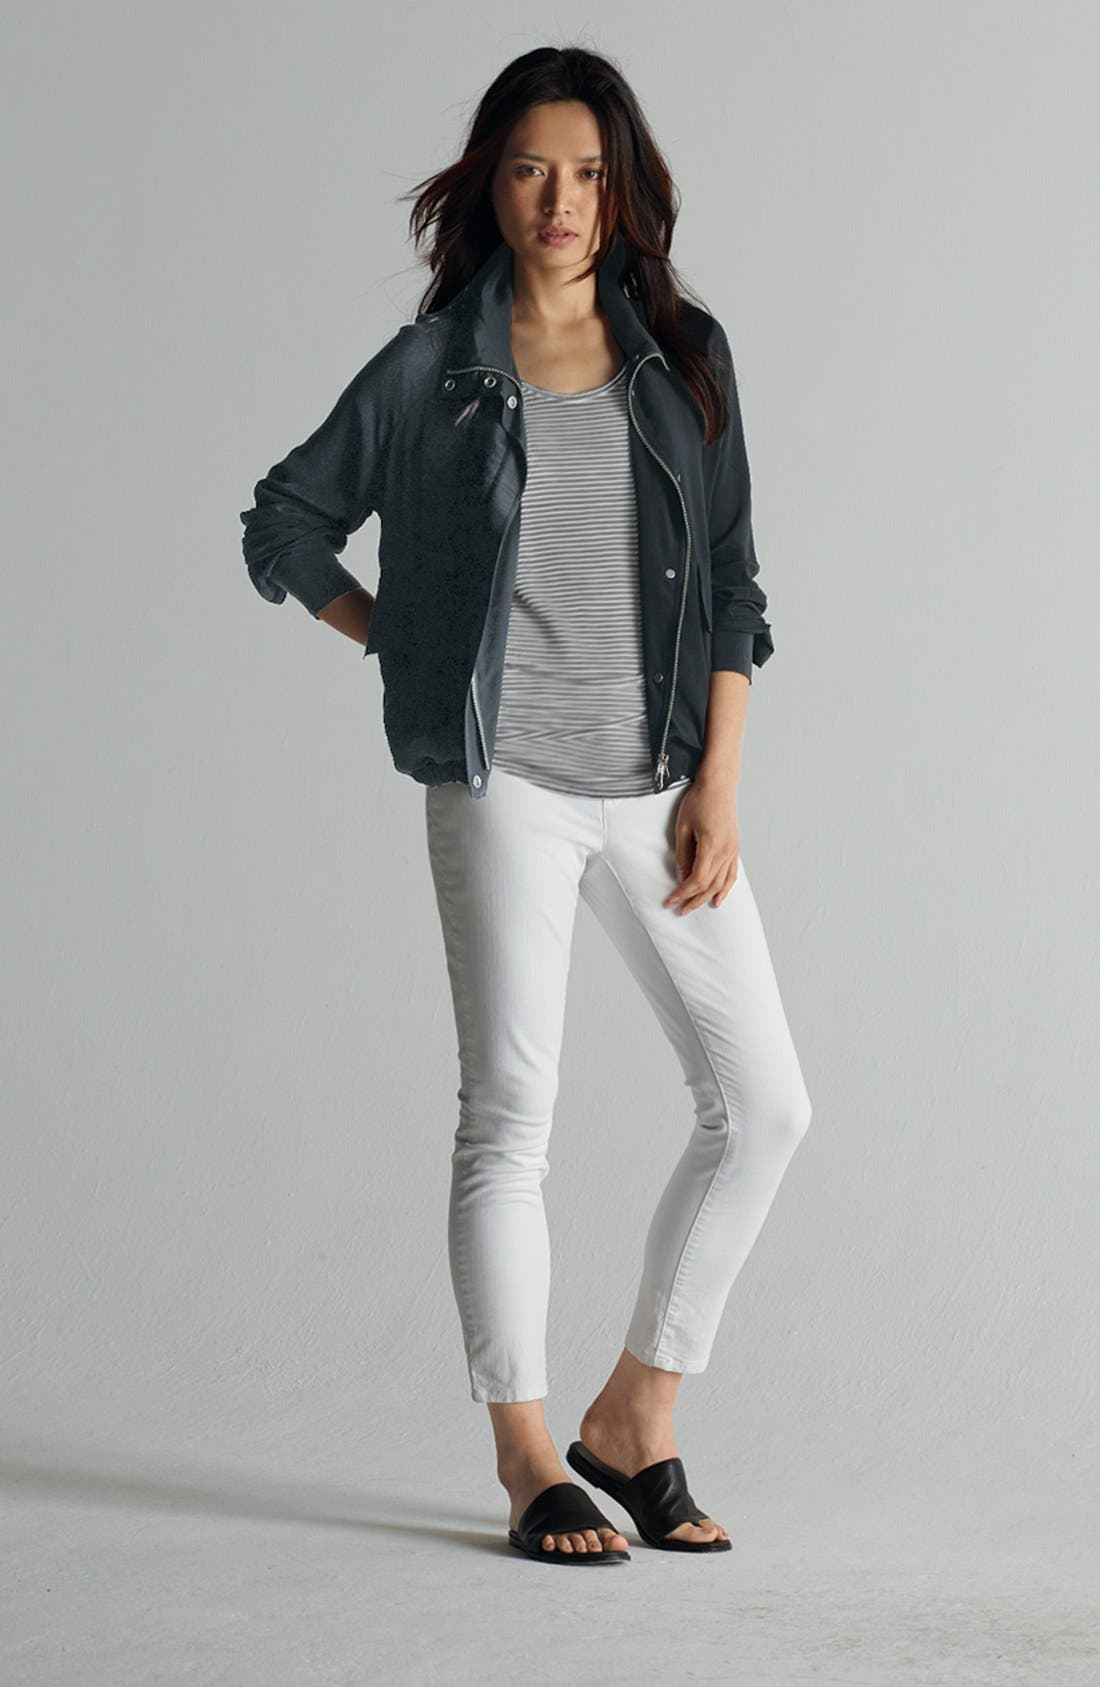 Main Image - Eileen Fisher Jacket, Tank & Skinny Jeans